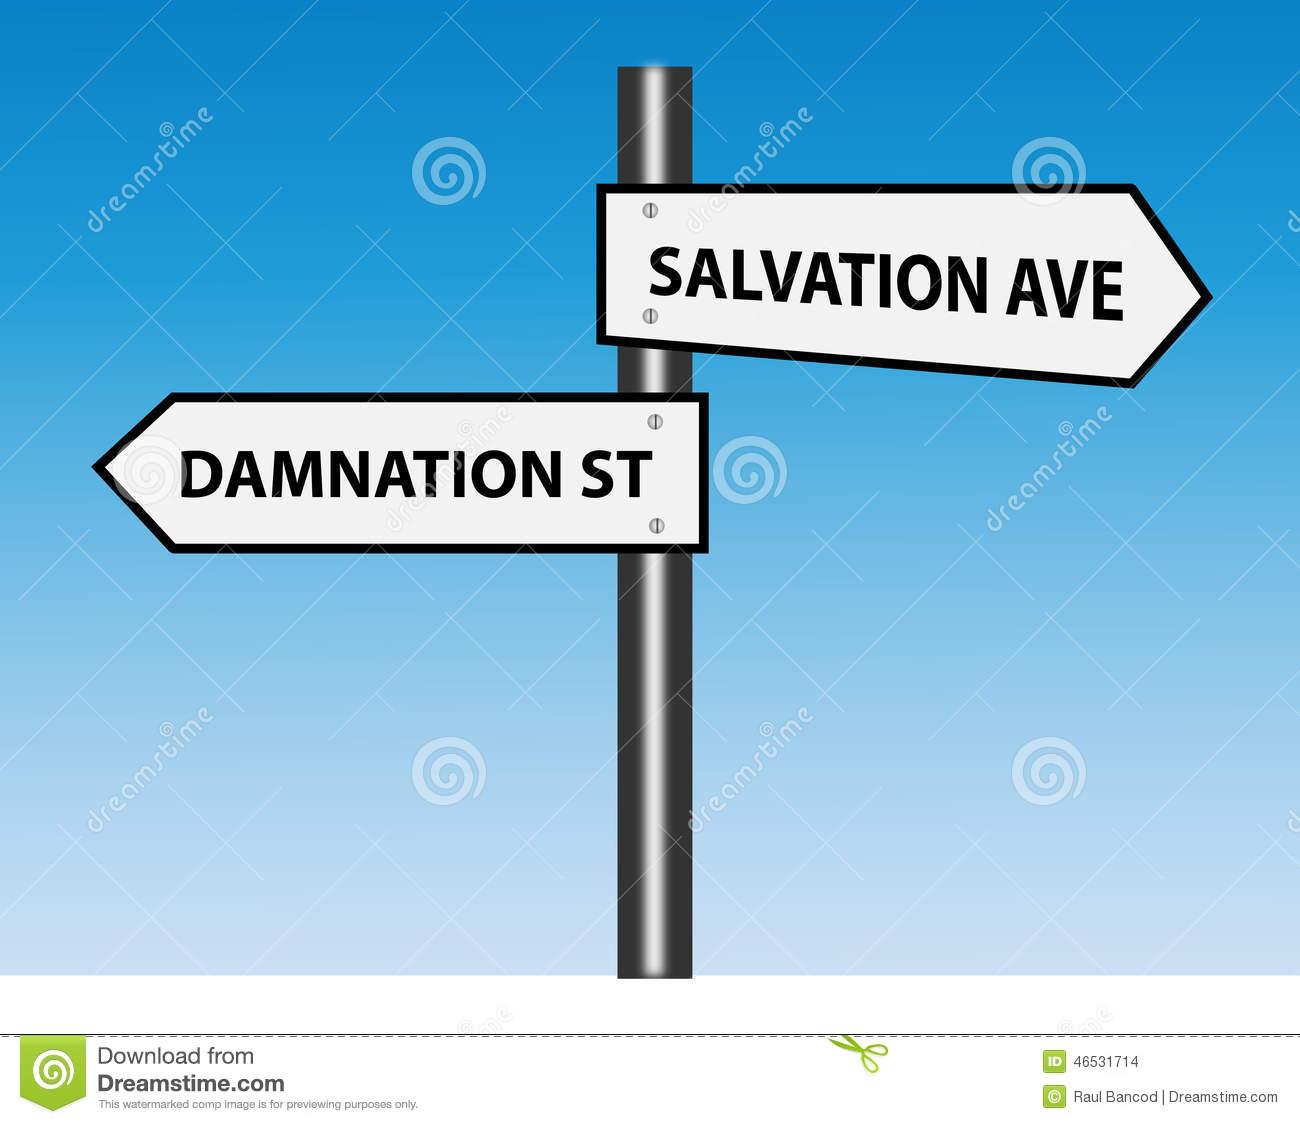 Damnation Stock Illustrations.